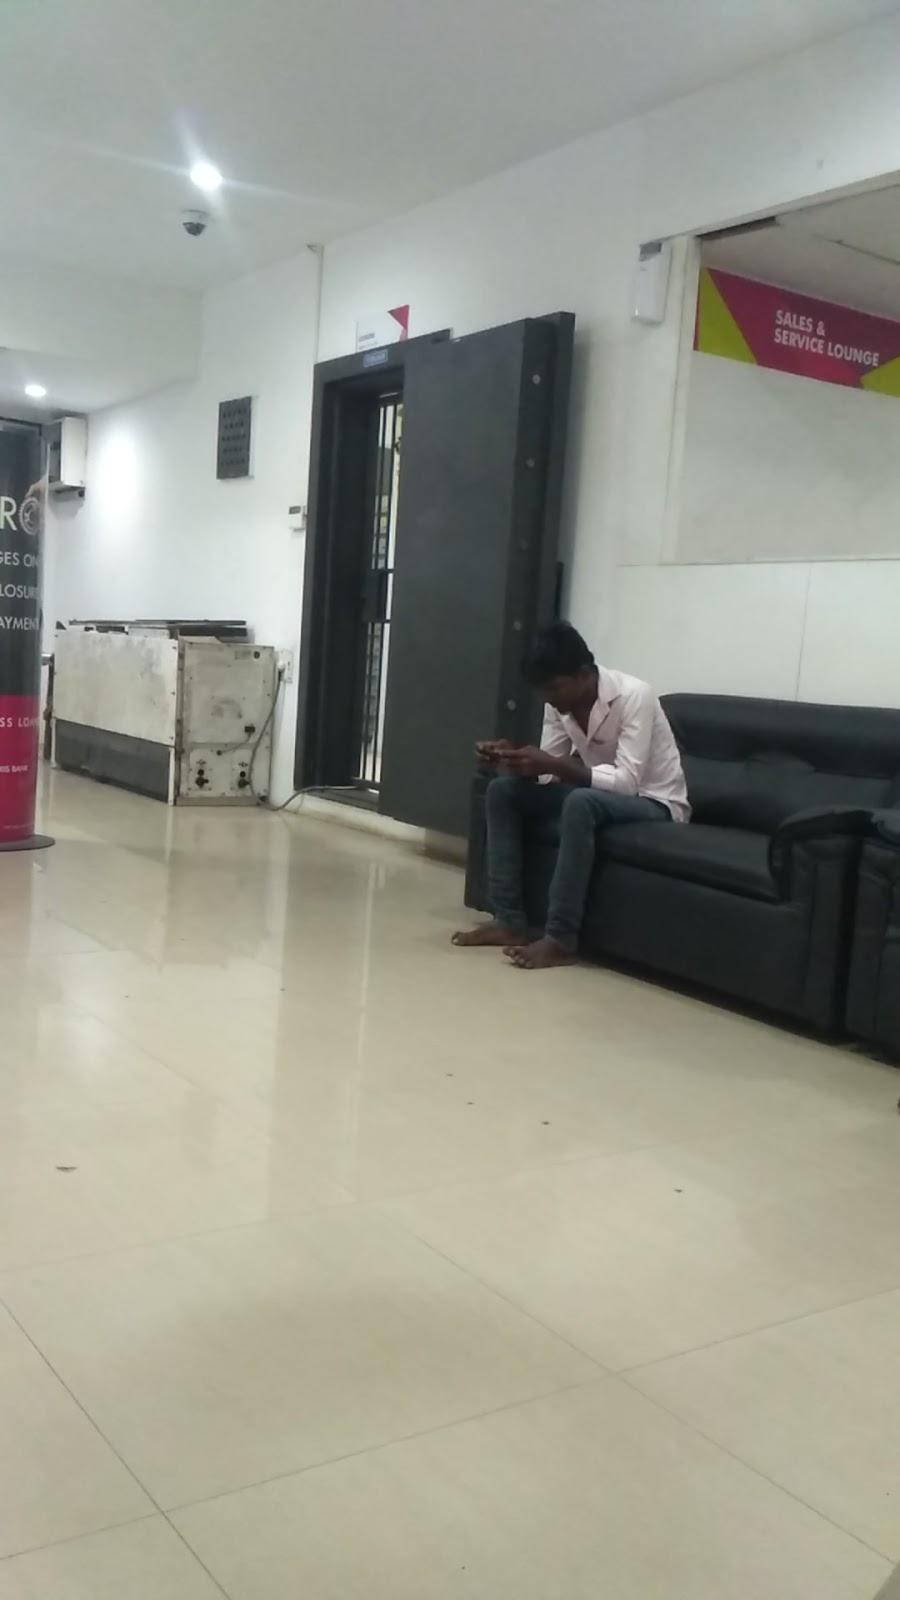 blood bank Axis Bank near Tiruchengode Tamil Nadu